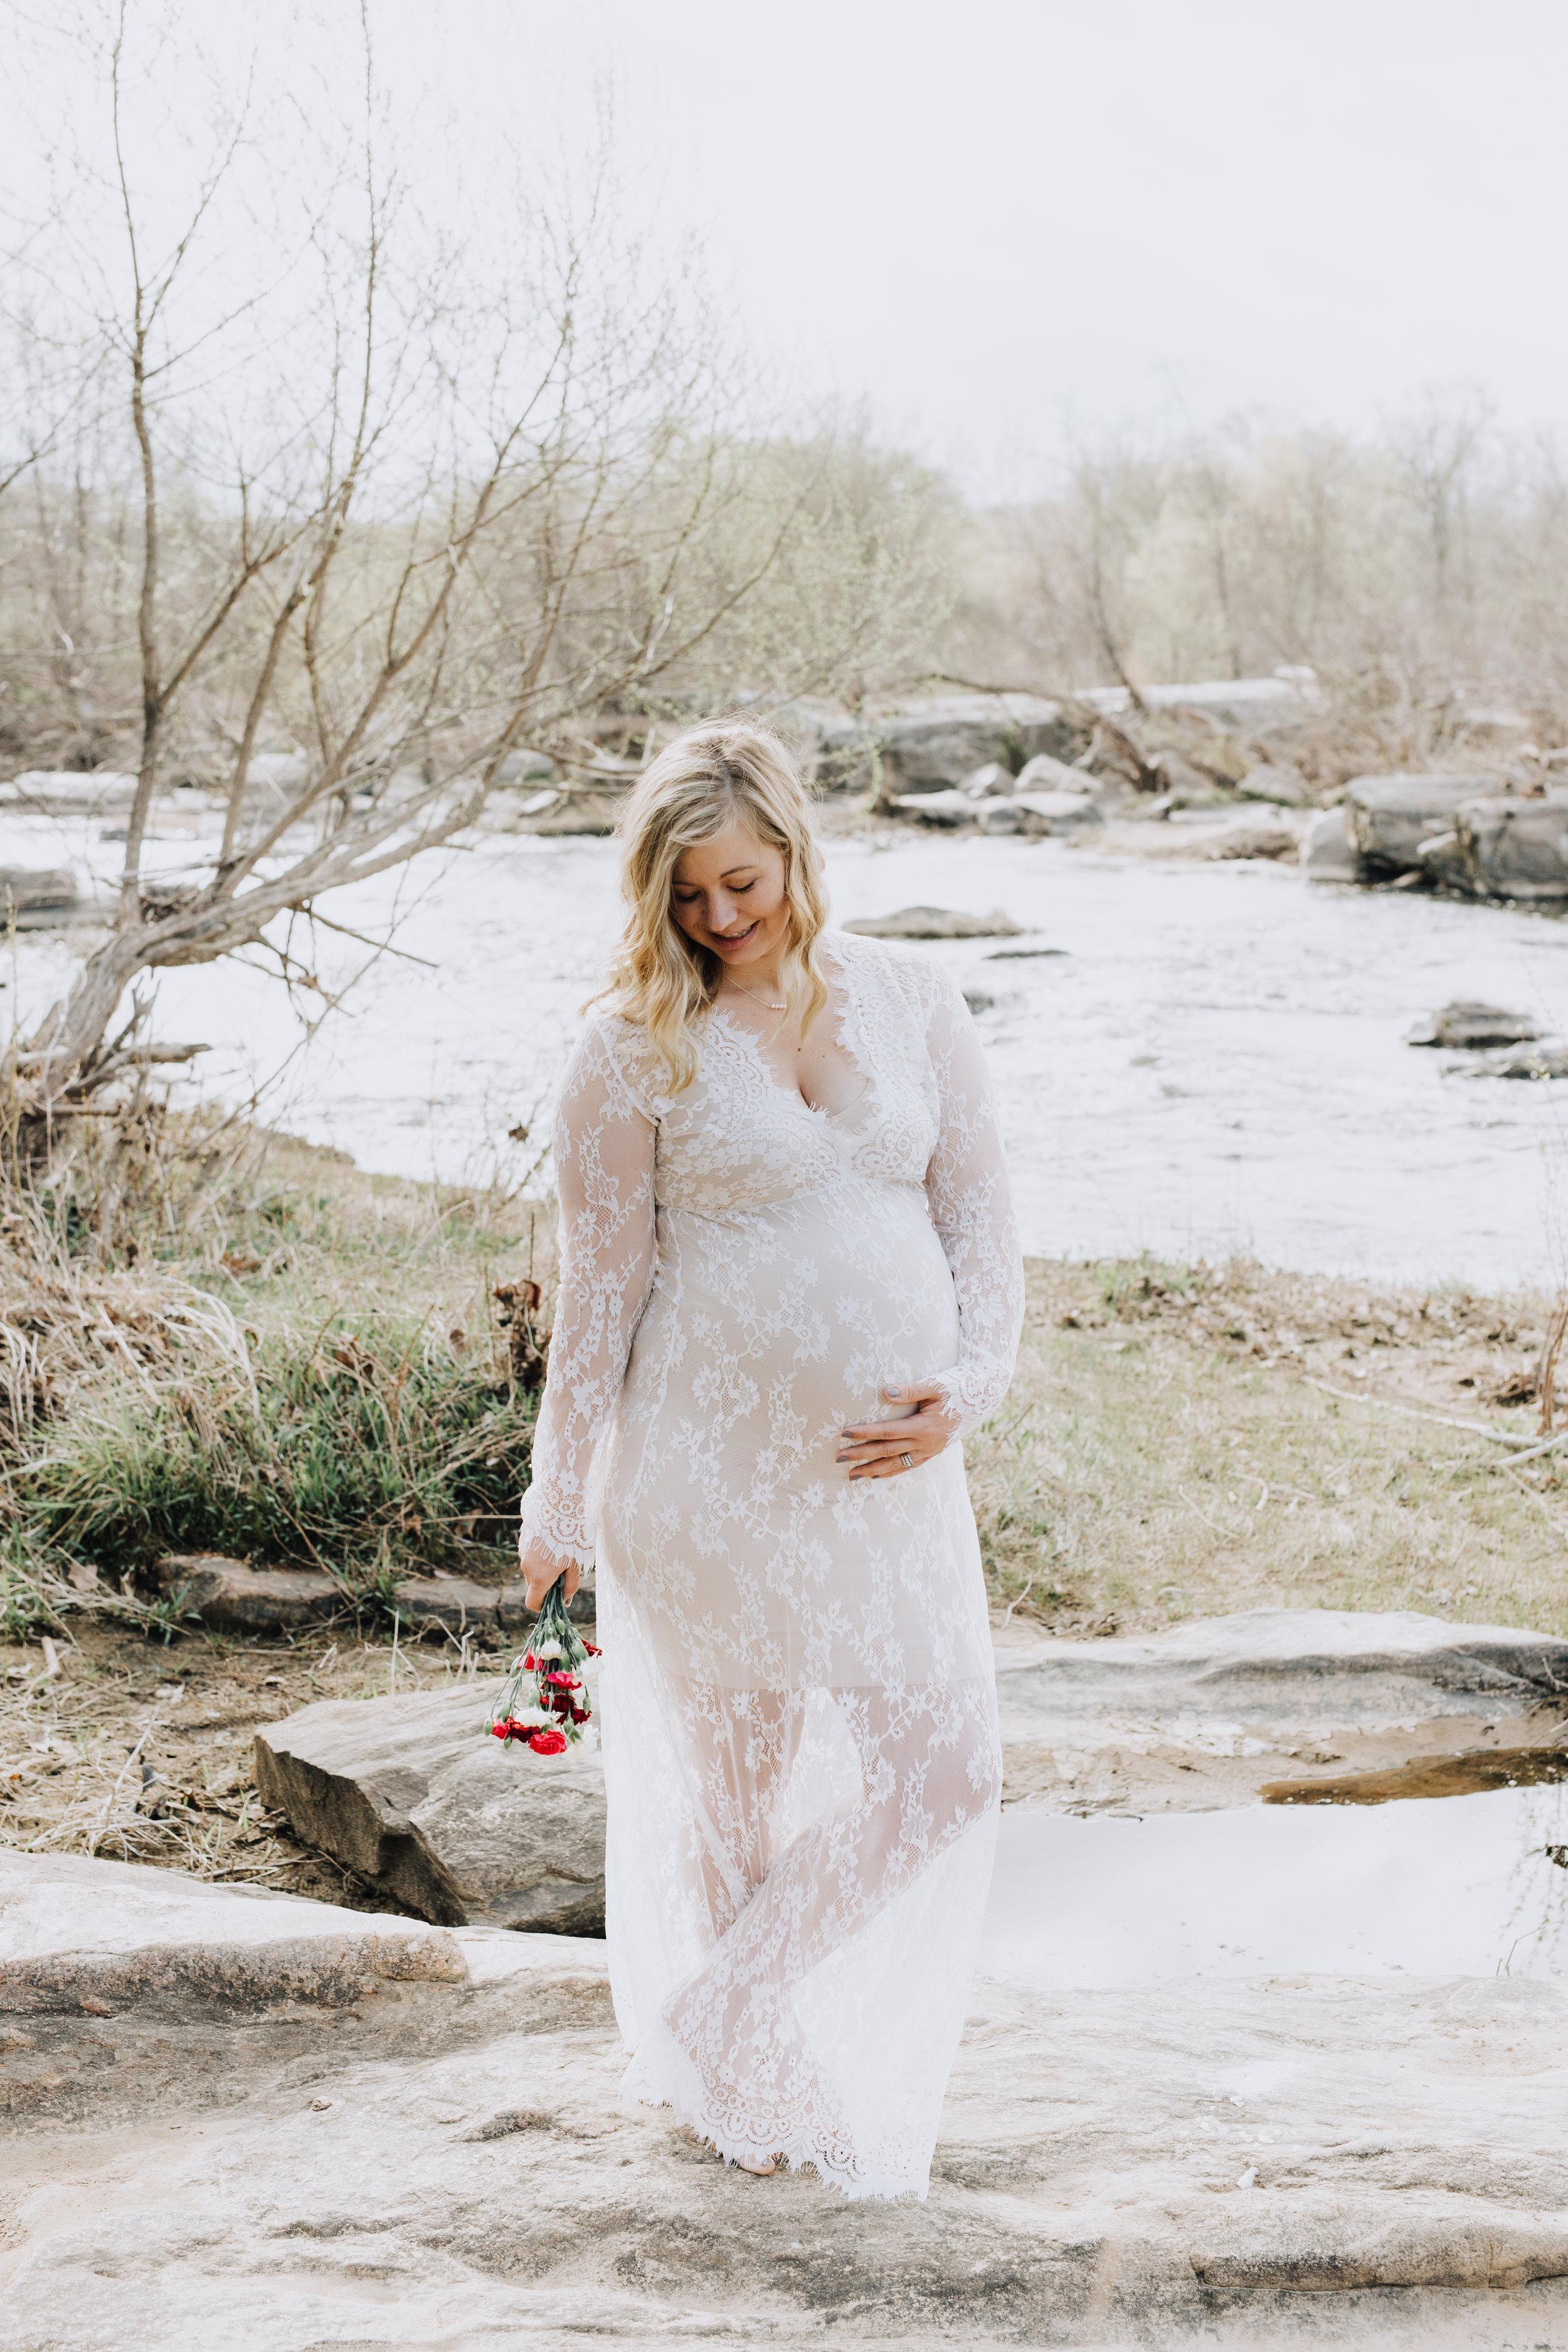 Fredericksburg_Virginia_Maternity_Photographer_Riverside (11).jpg